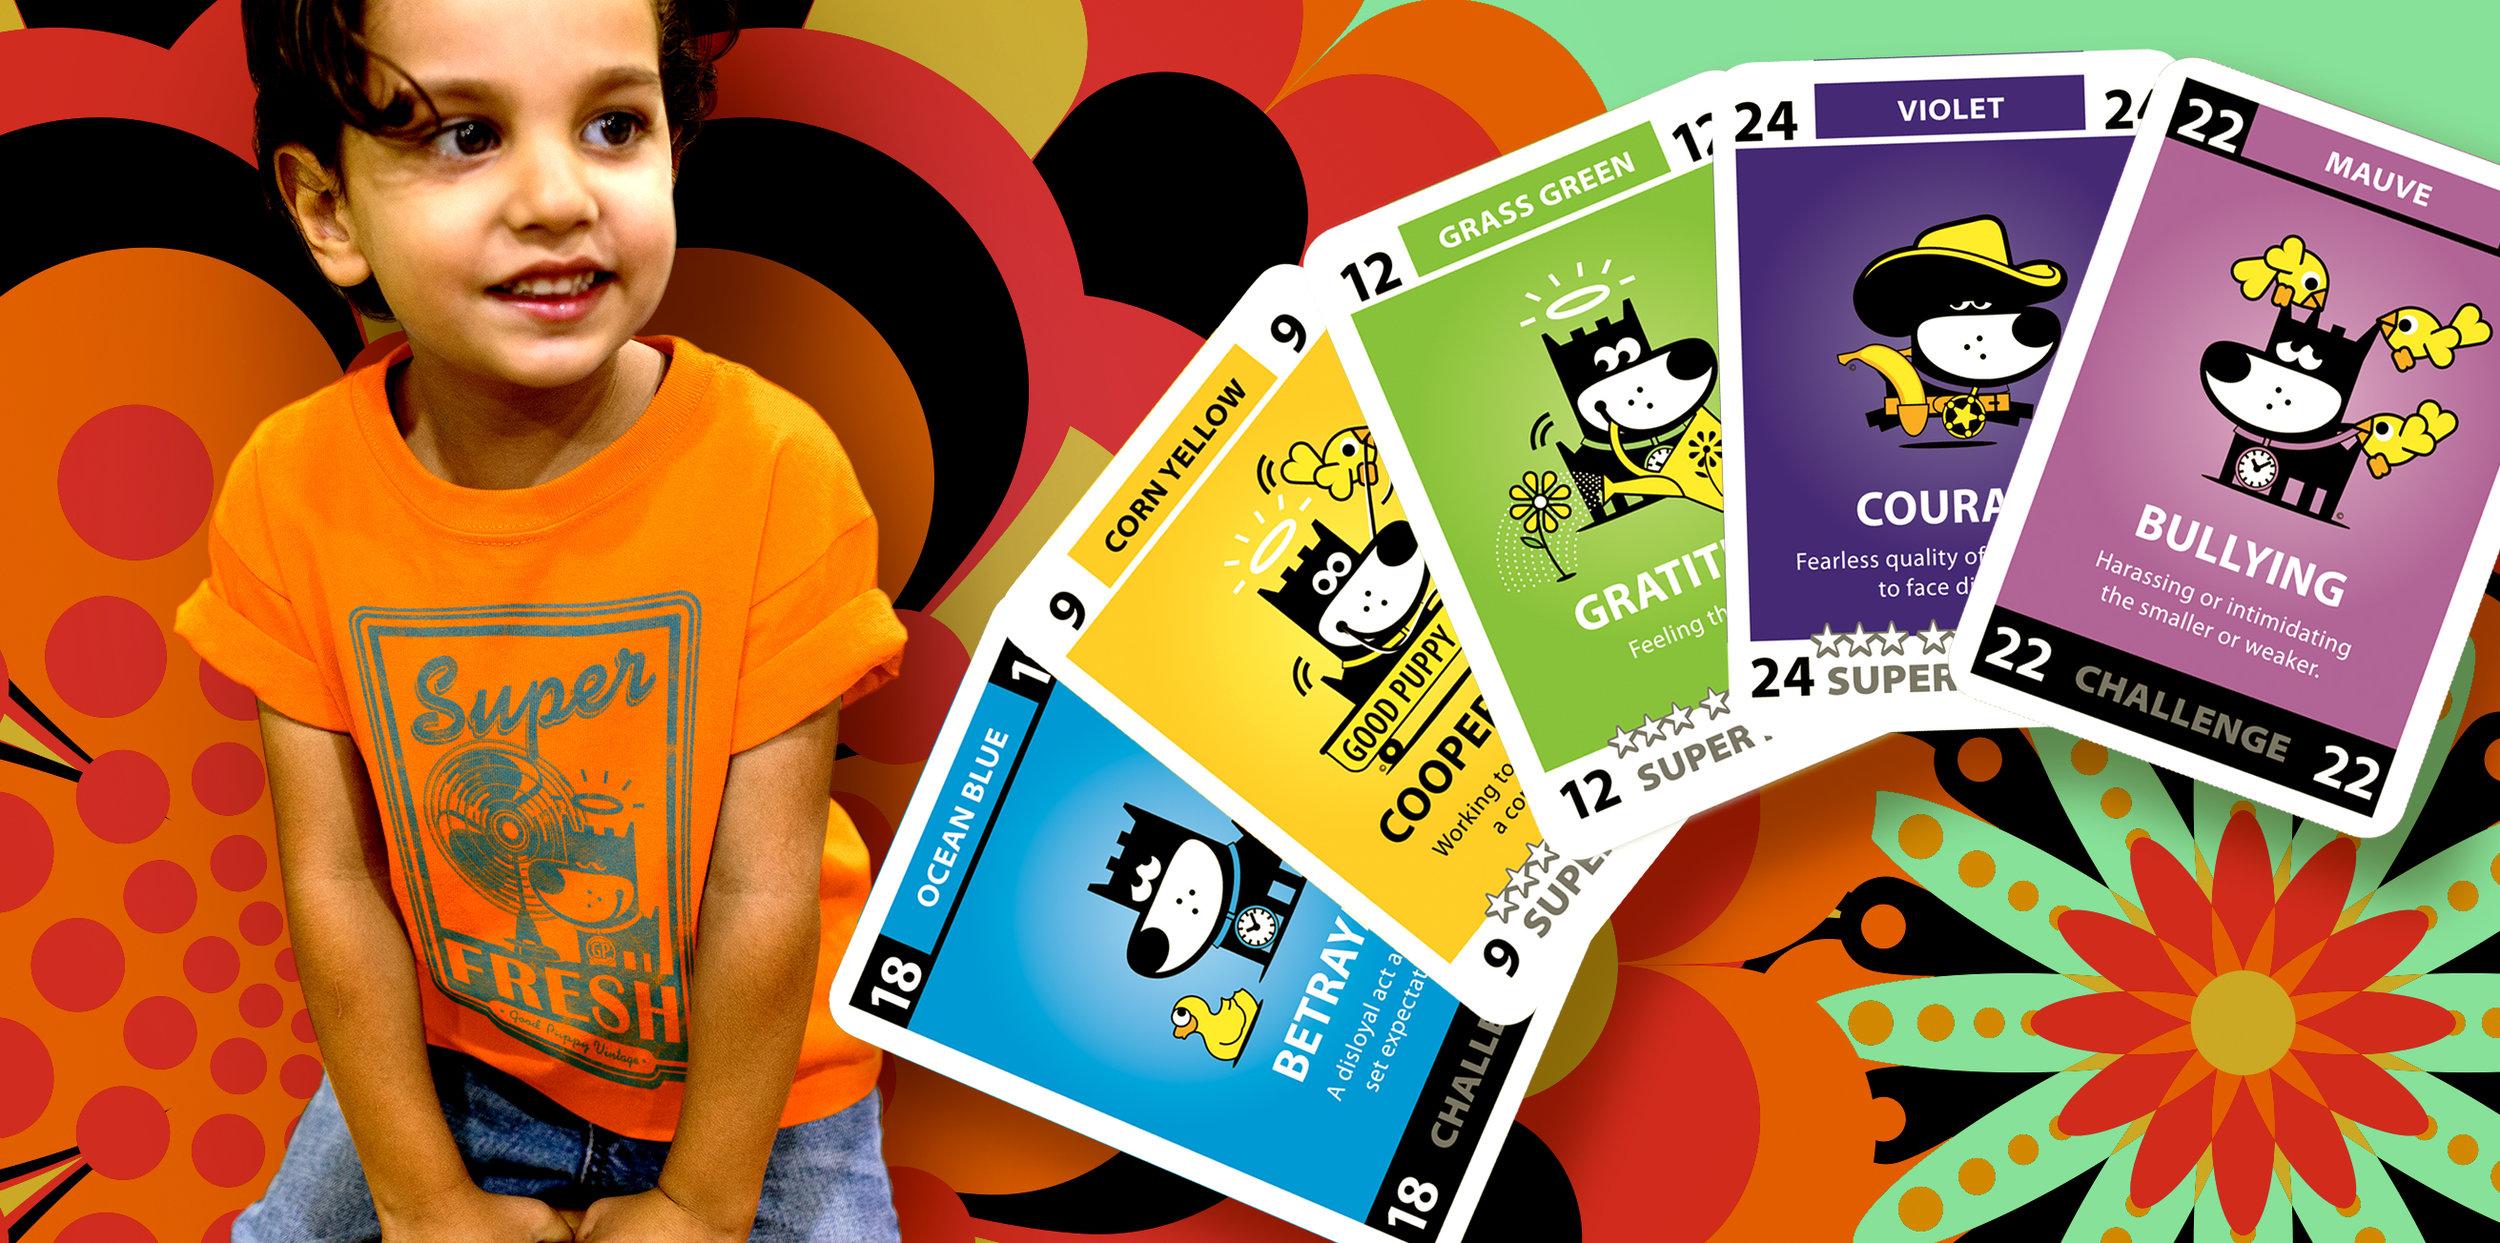 GOOD PUPPY Innerchi Super Powers Card Set